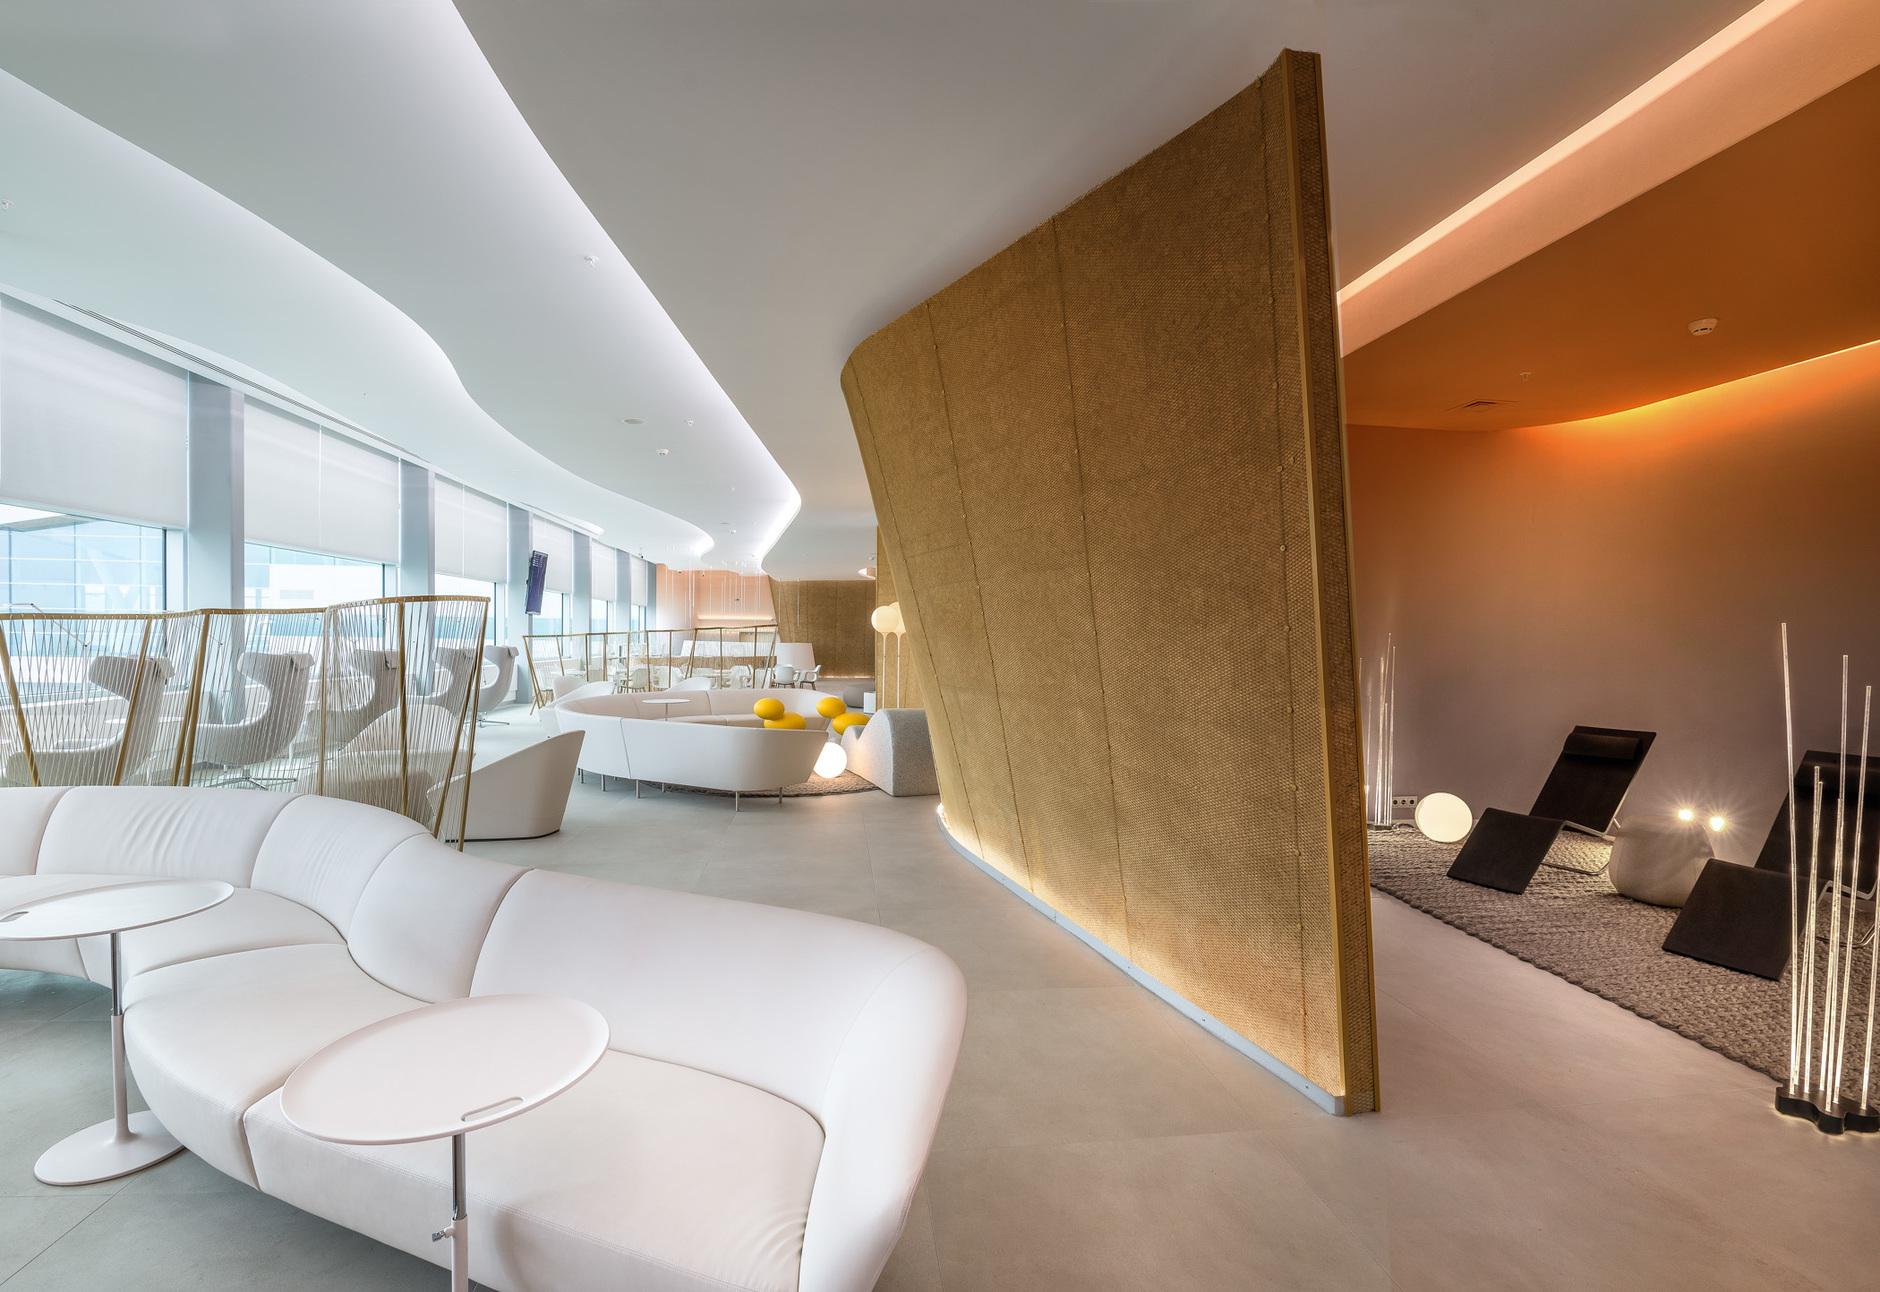 Бизнес-лаунж аэропорта «Платов» в Ростове-на-Дону: проект VOX Architects (галерея 9, фото 4)